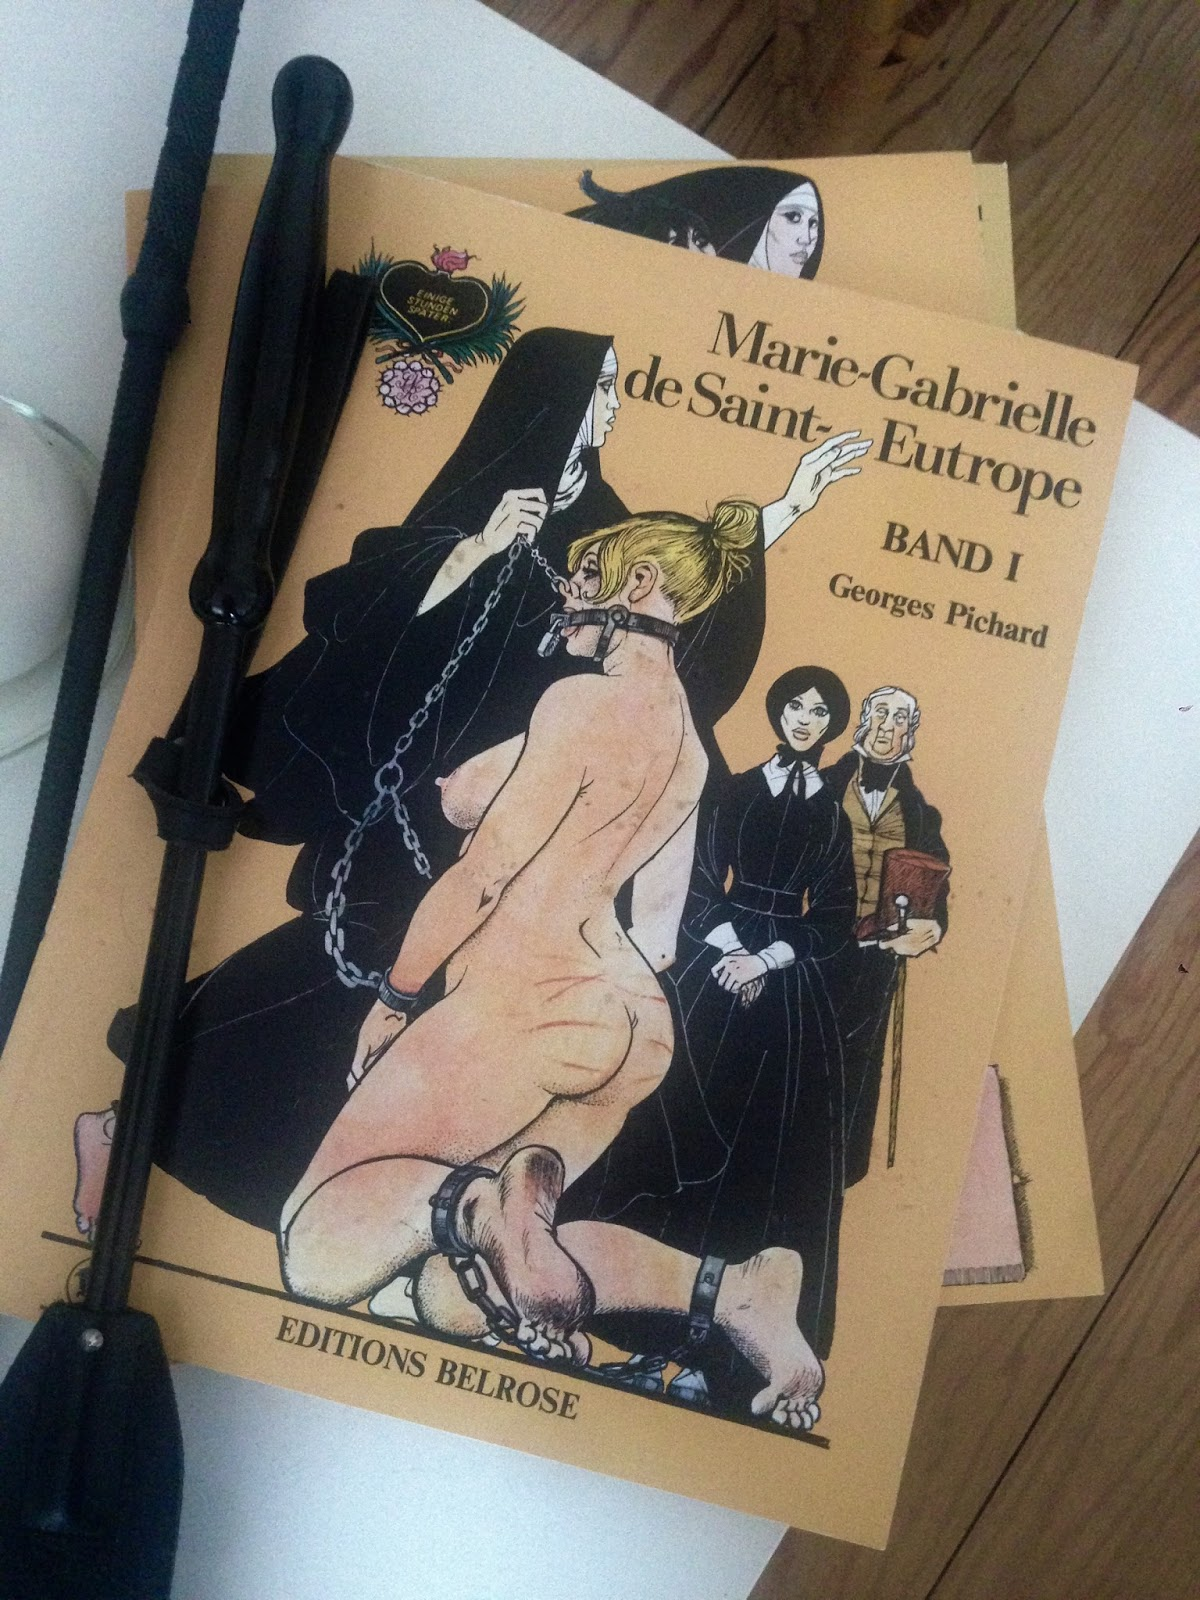 Die Welt der Marie-Gabrielle de Saint-Eutrope